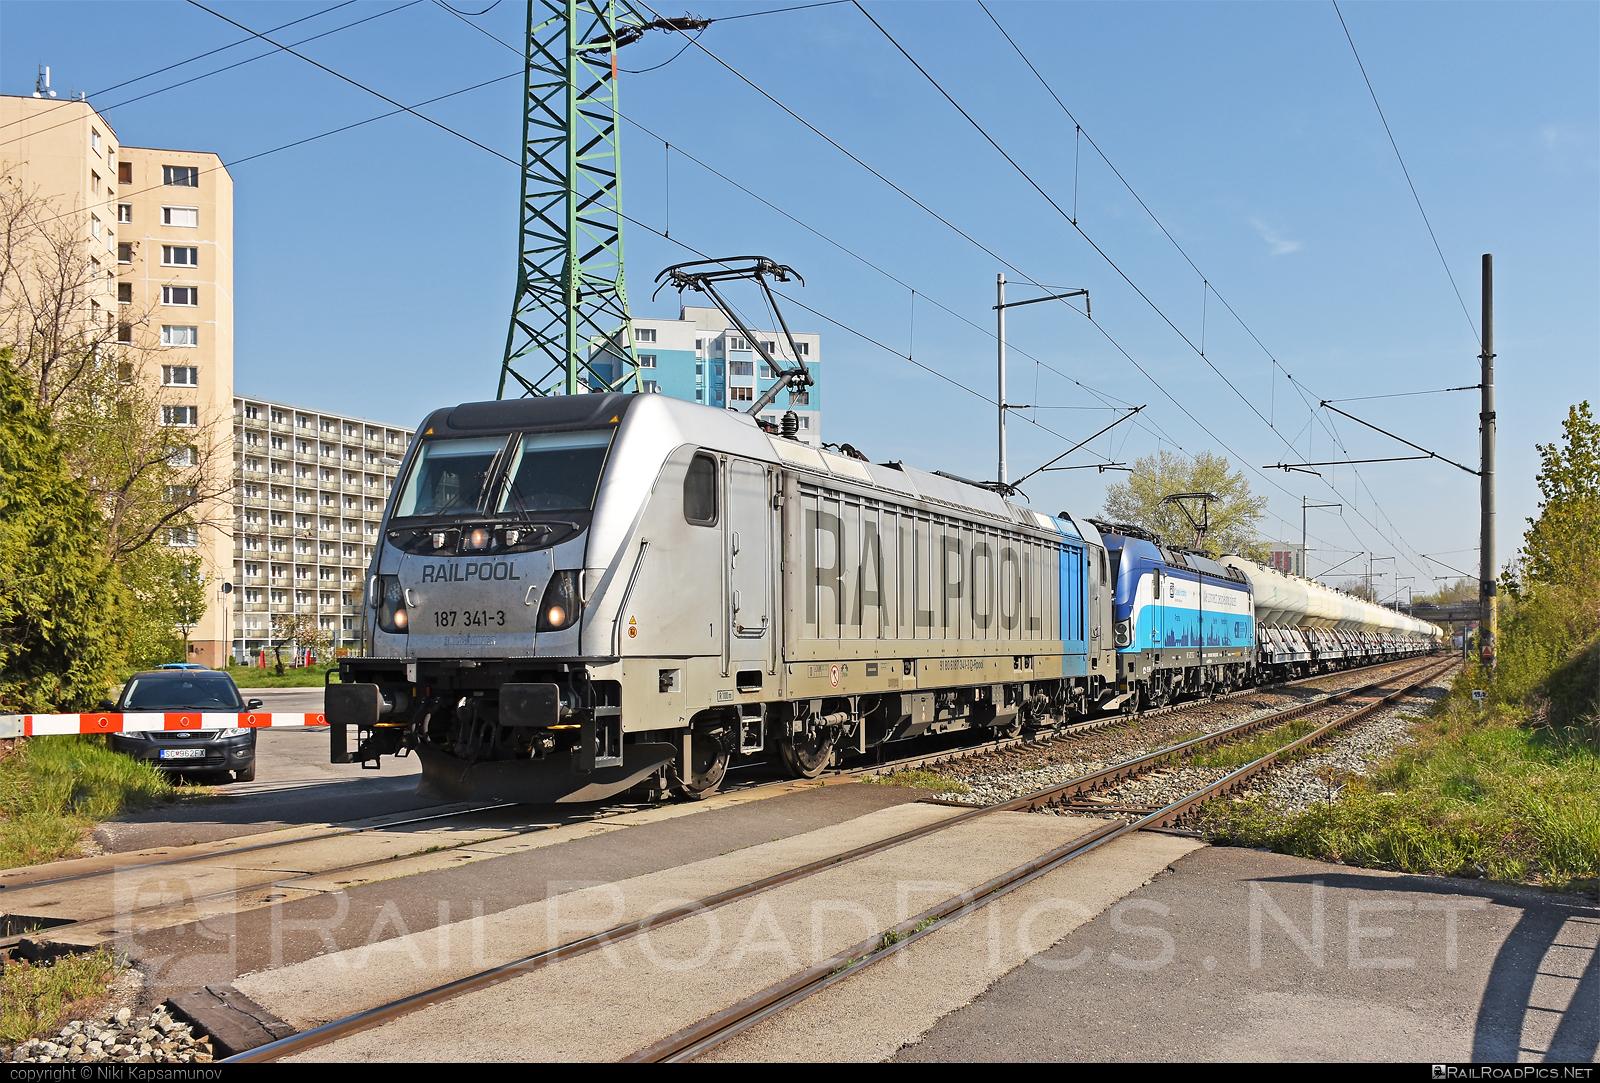 Bombardier TRAXX F160 AC3 - 187 341-3 operated by ČD Cargo, a.s. #bombardier #bombardiertraxx #cdcargo #cdcargoniederlassungwien #railpool #railpoolgmbh #traxx #traxxf160 #traxxf160ac #traxxf160ac3